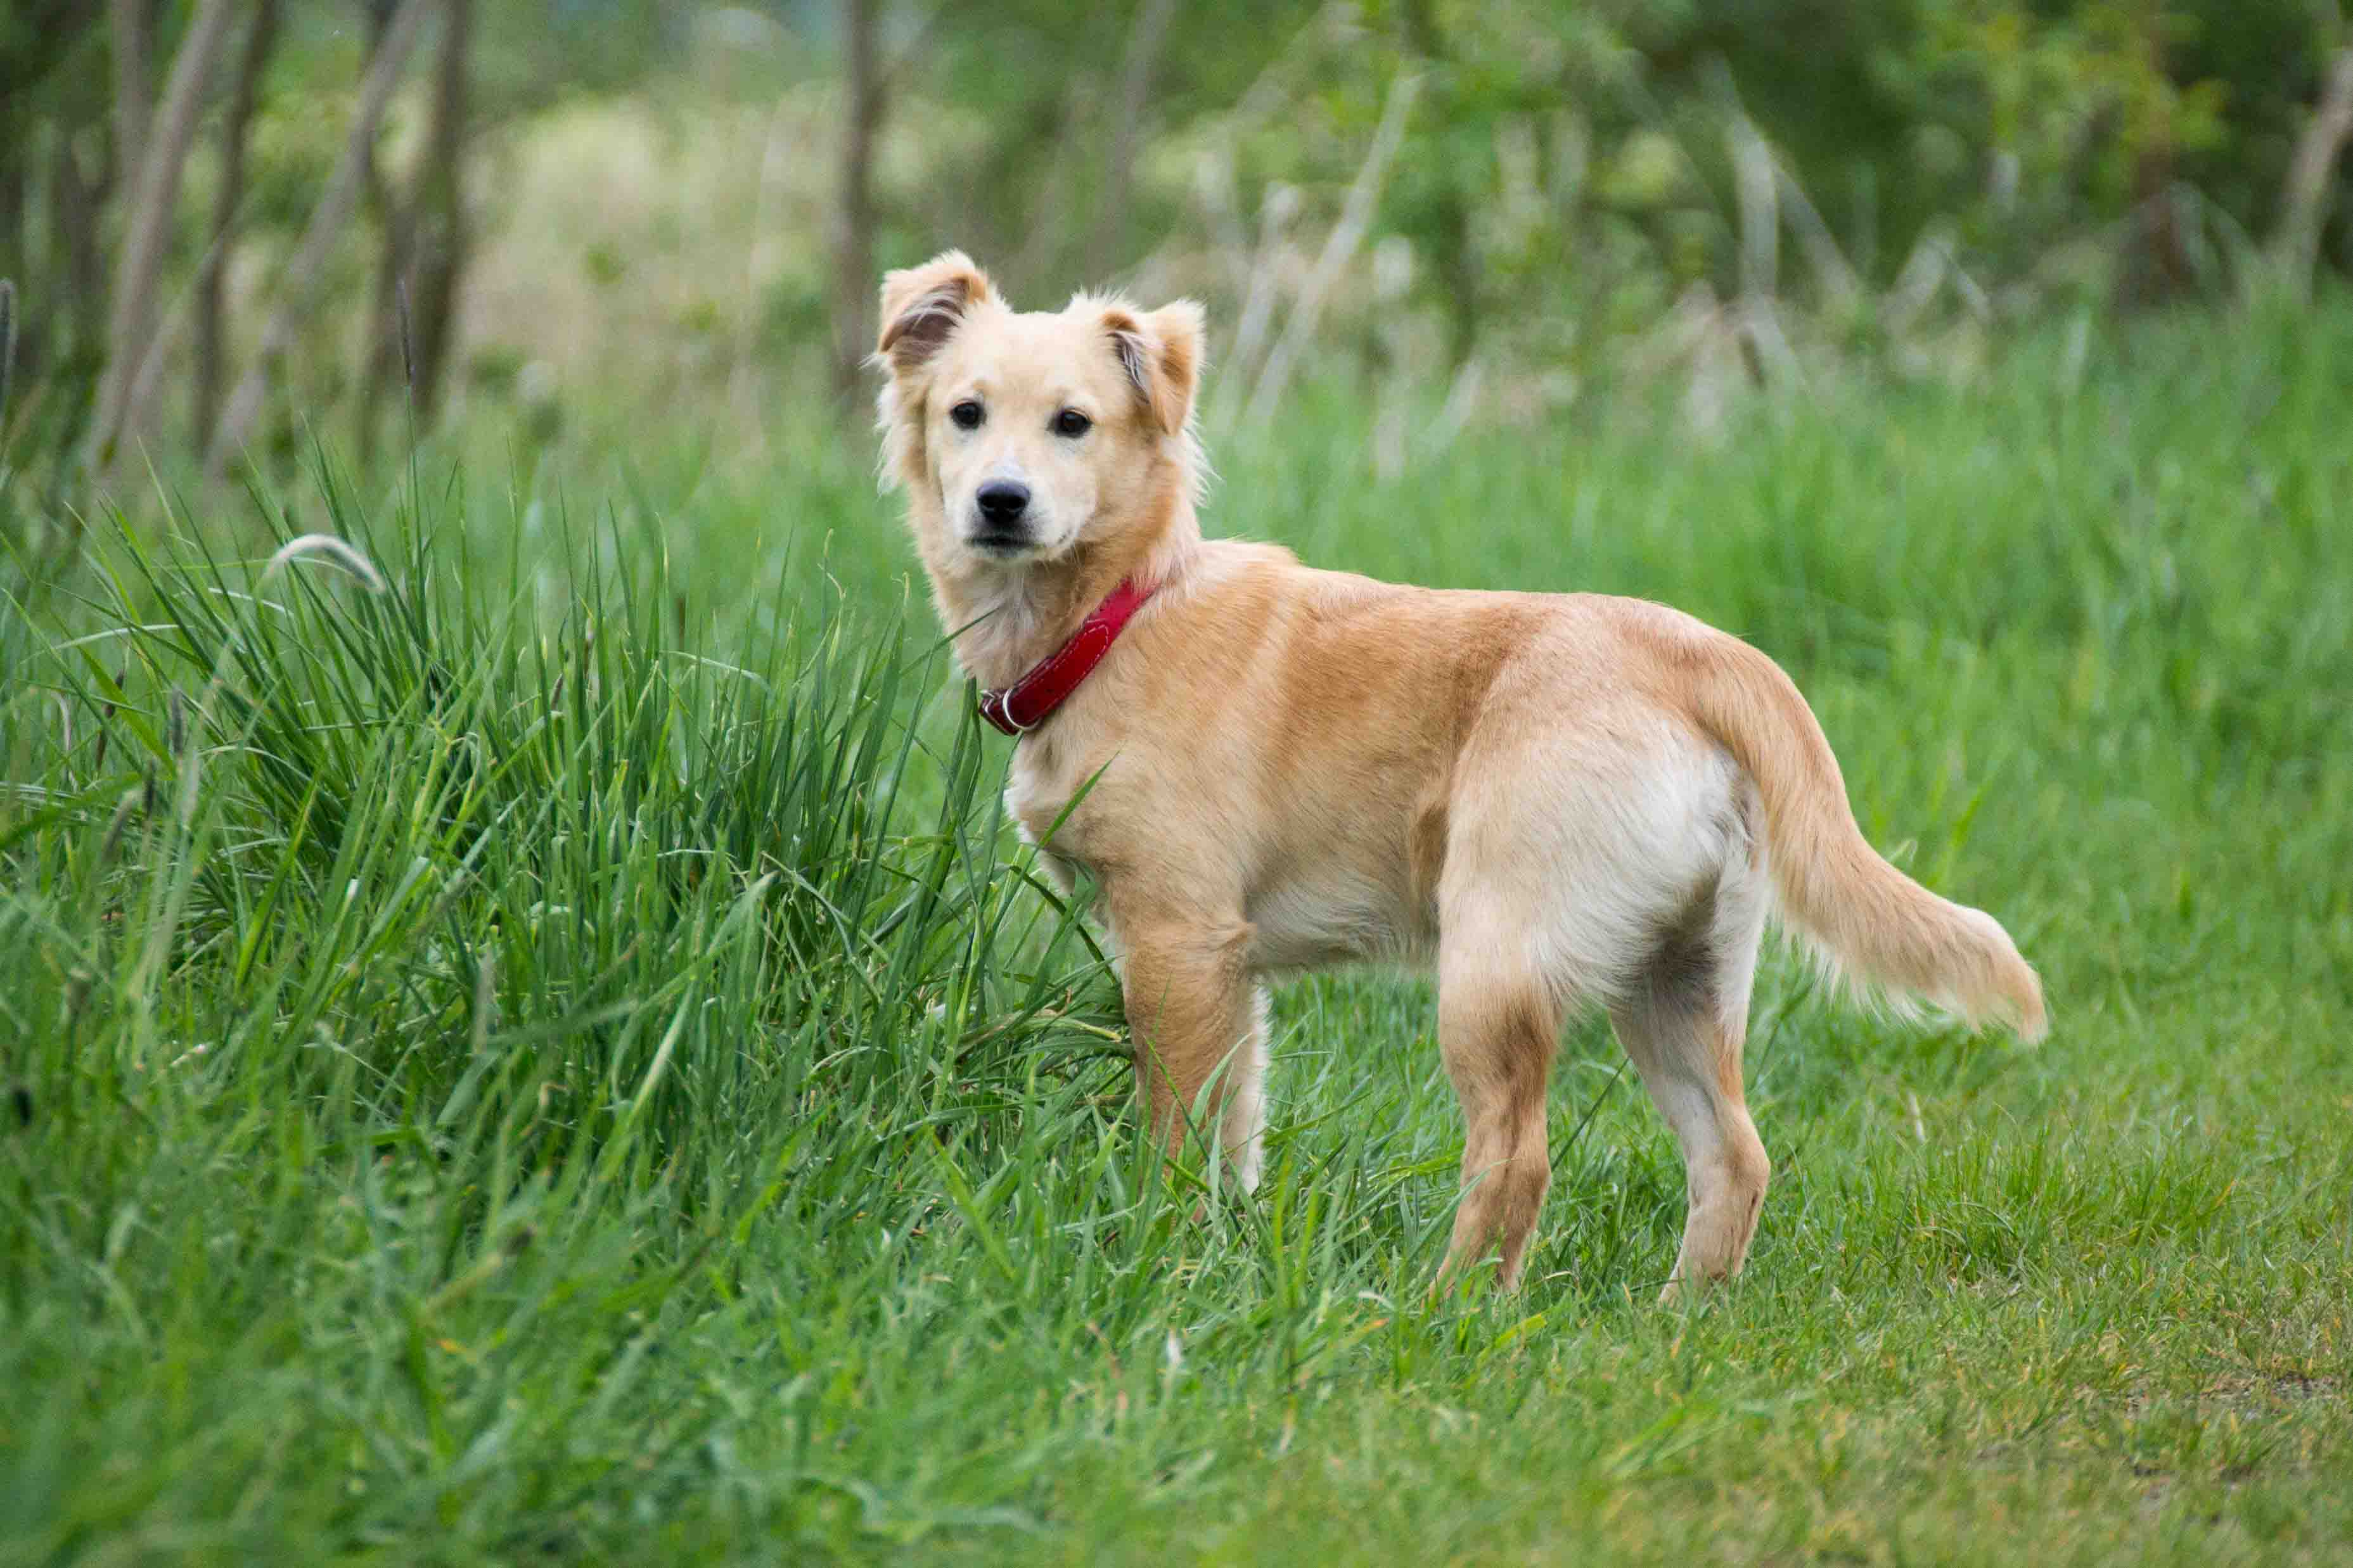 Tierfotografie und Hundefotografie IMG 5216w